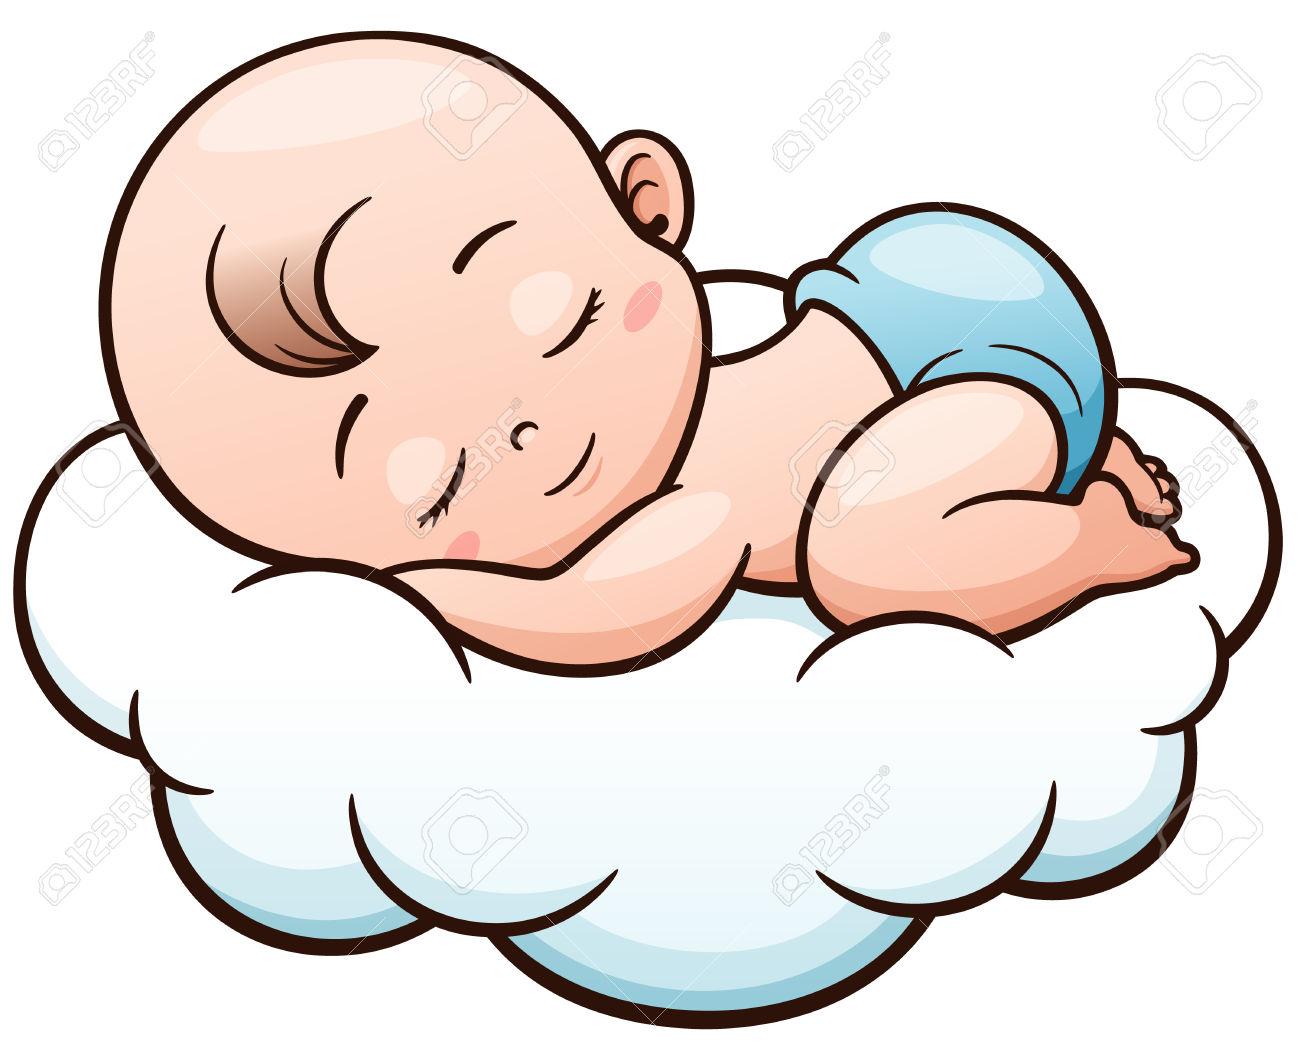 Baby Sleeping Clipart.